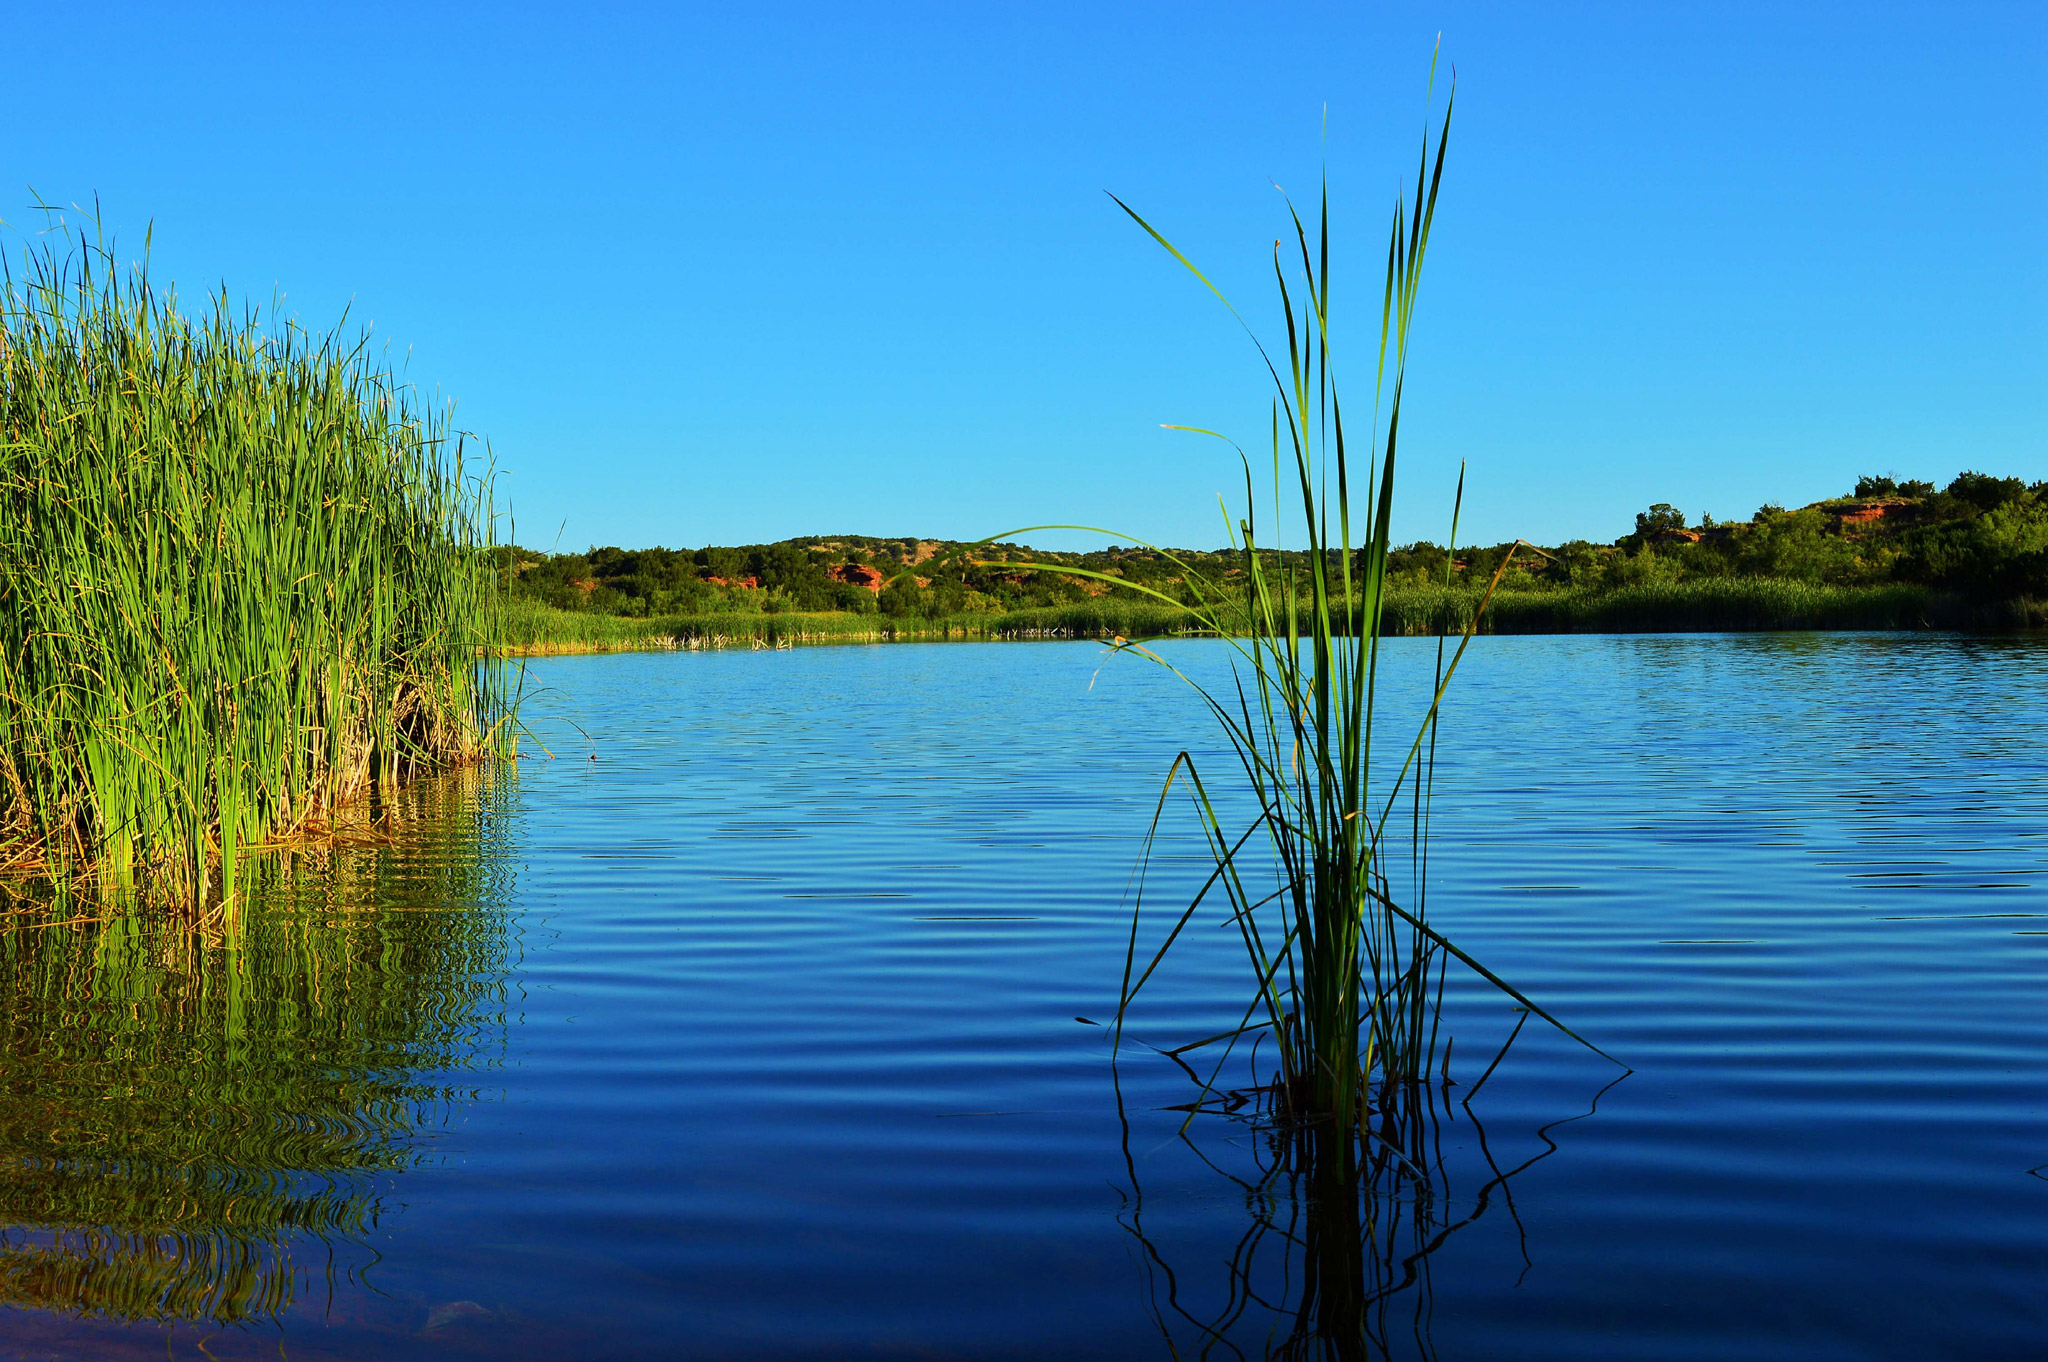 Morning on Big Pond